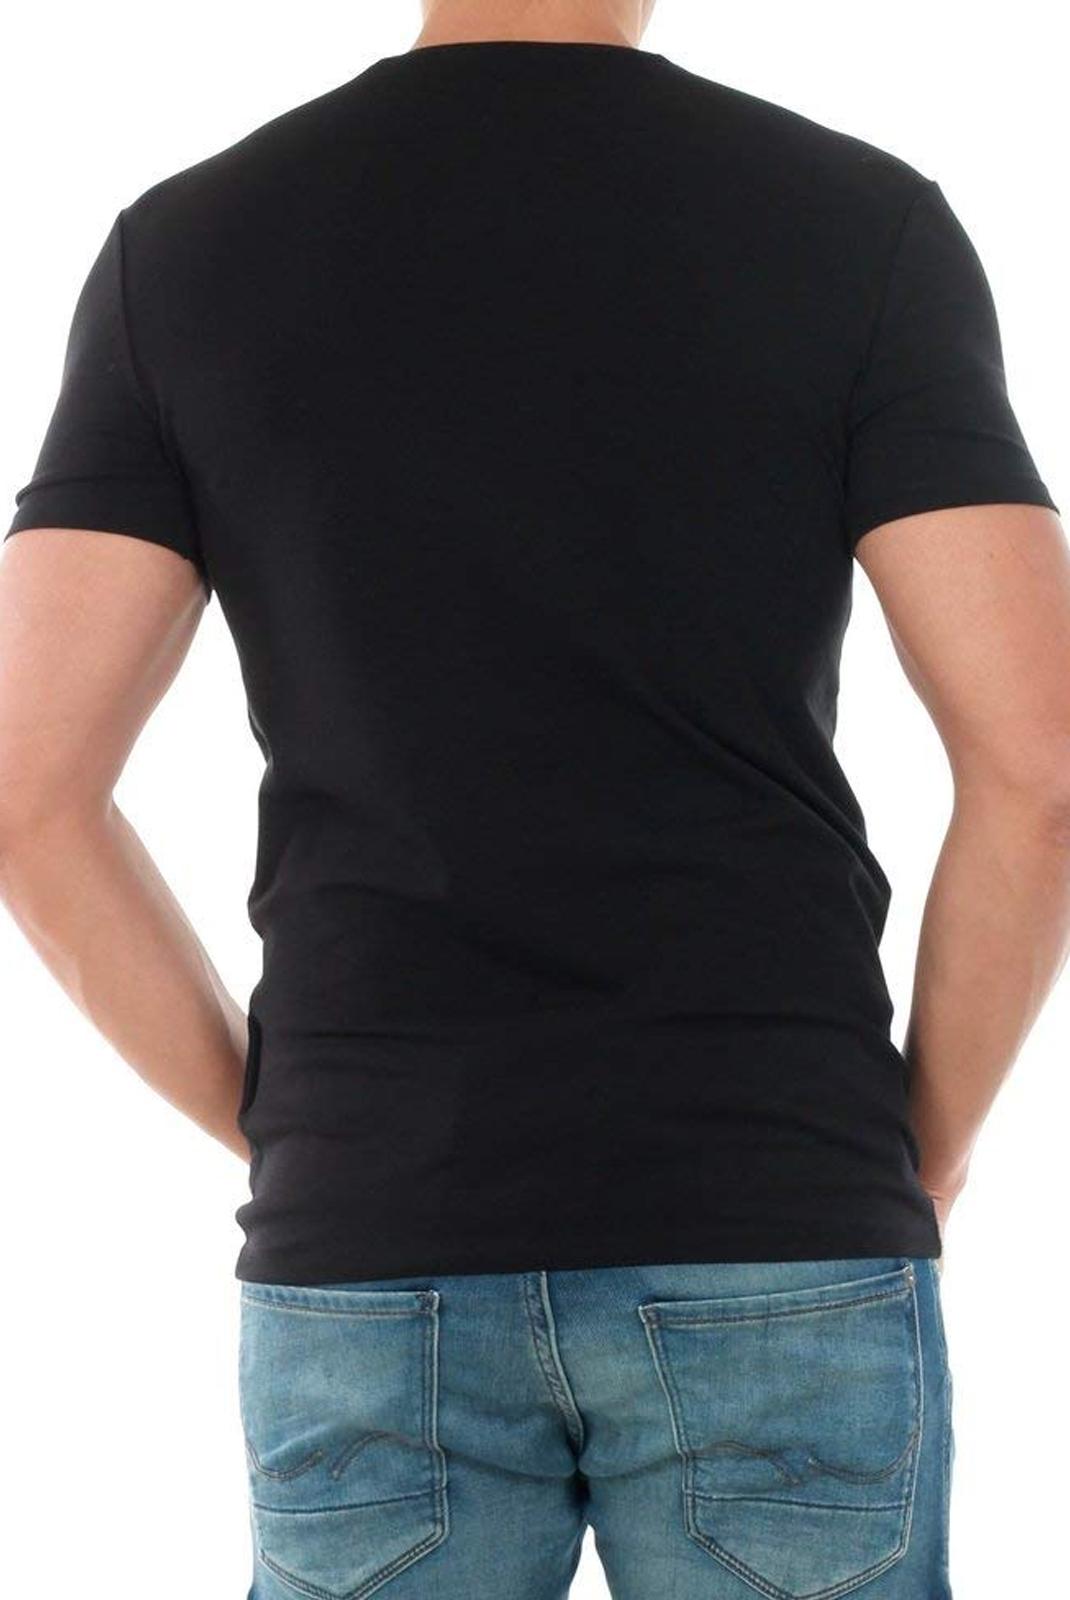 T-S manches courtes  Guess jeans M83I31 J1300 JBLK